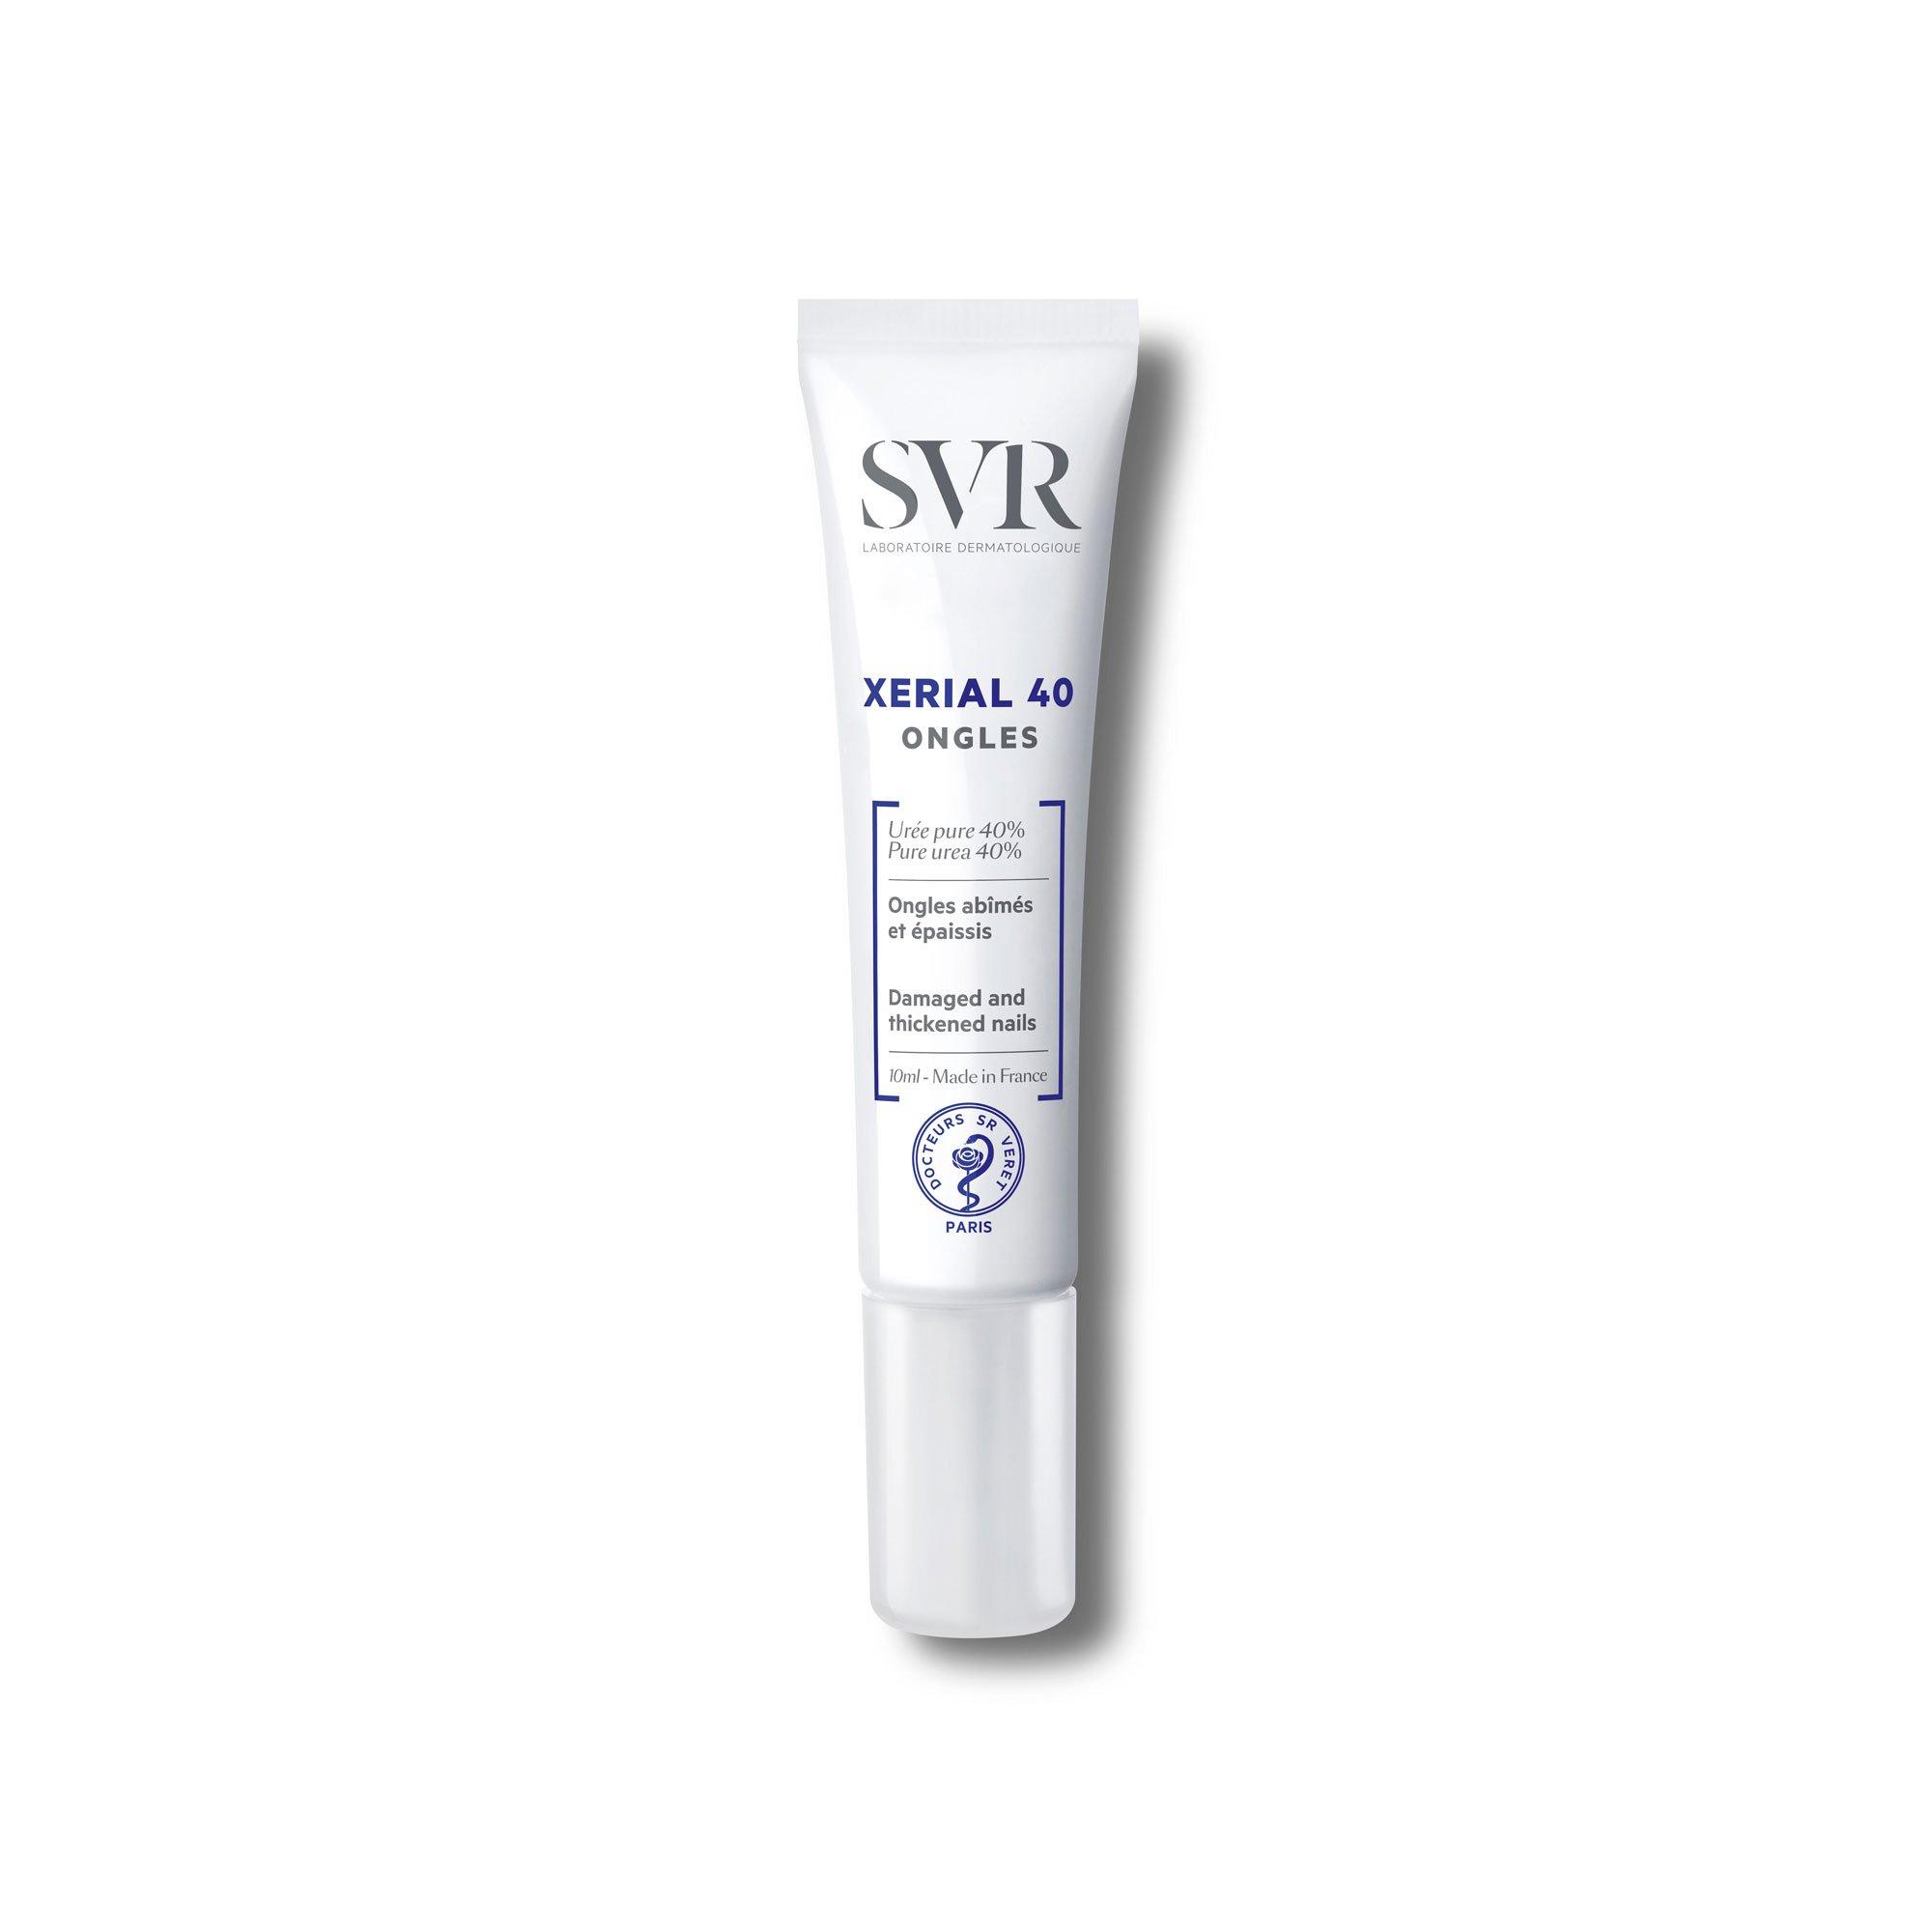 svr-xerial-40-nails-gel-10ml-kuwait-online